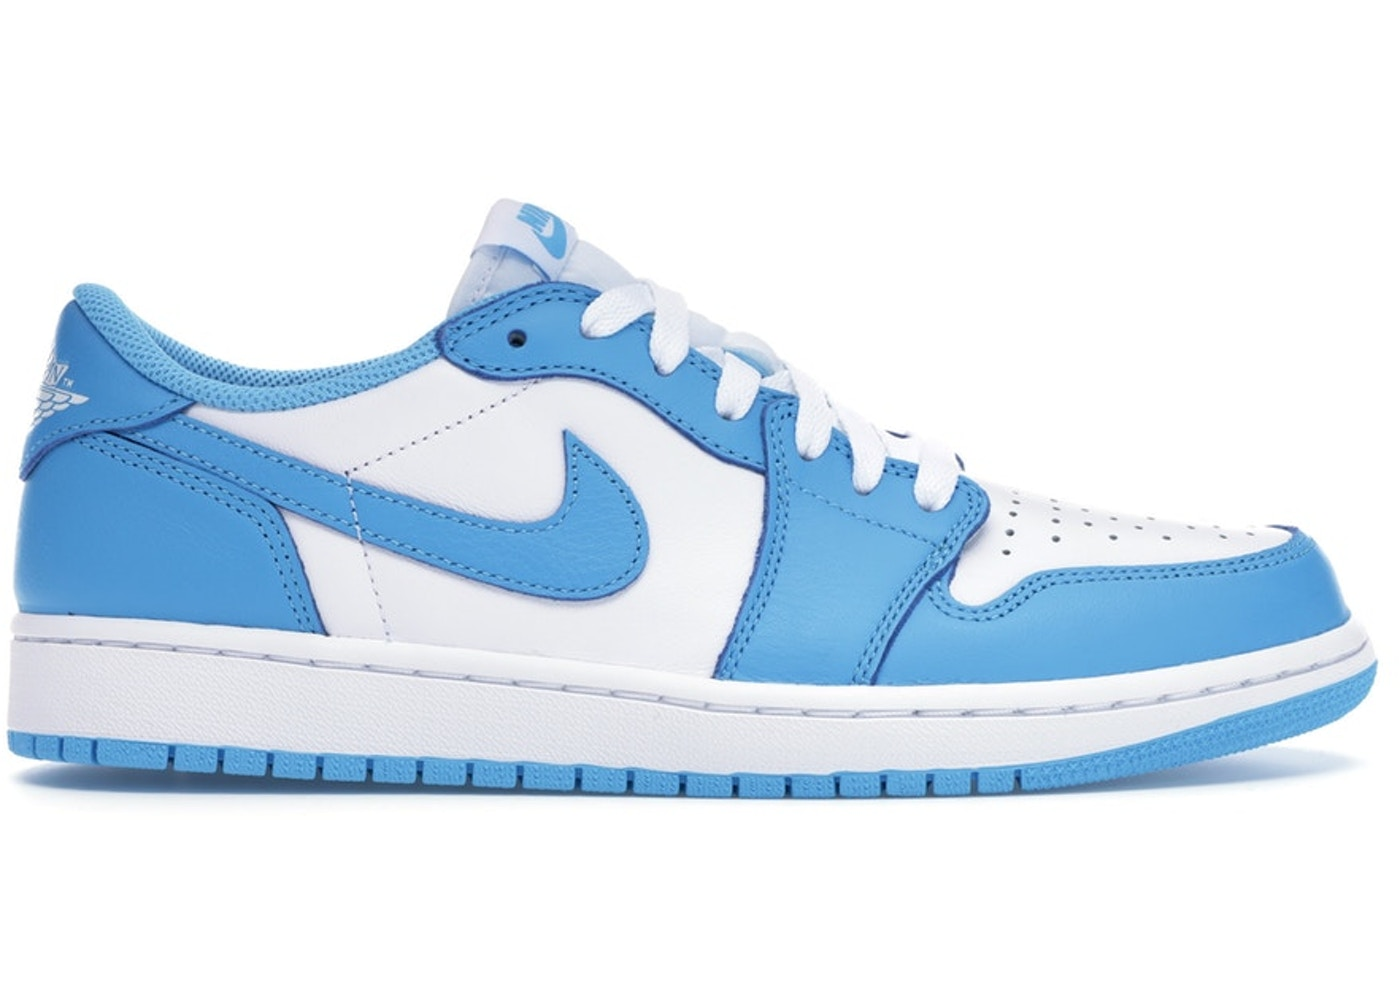 buy popular 282c7 f4345 Buy Air Jordan Shoes & Deadstock Sneakers